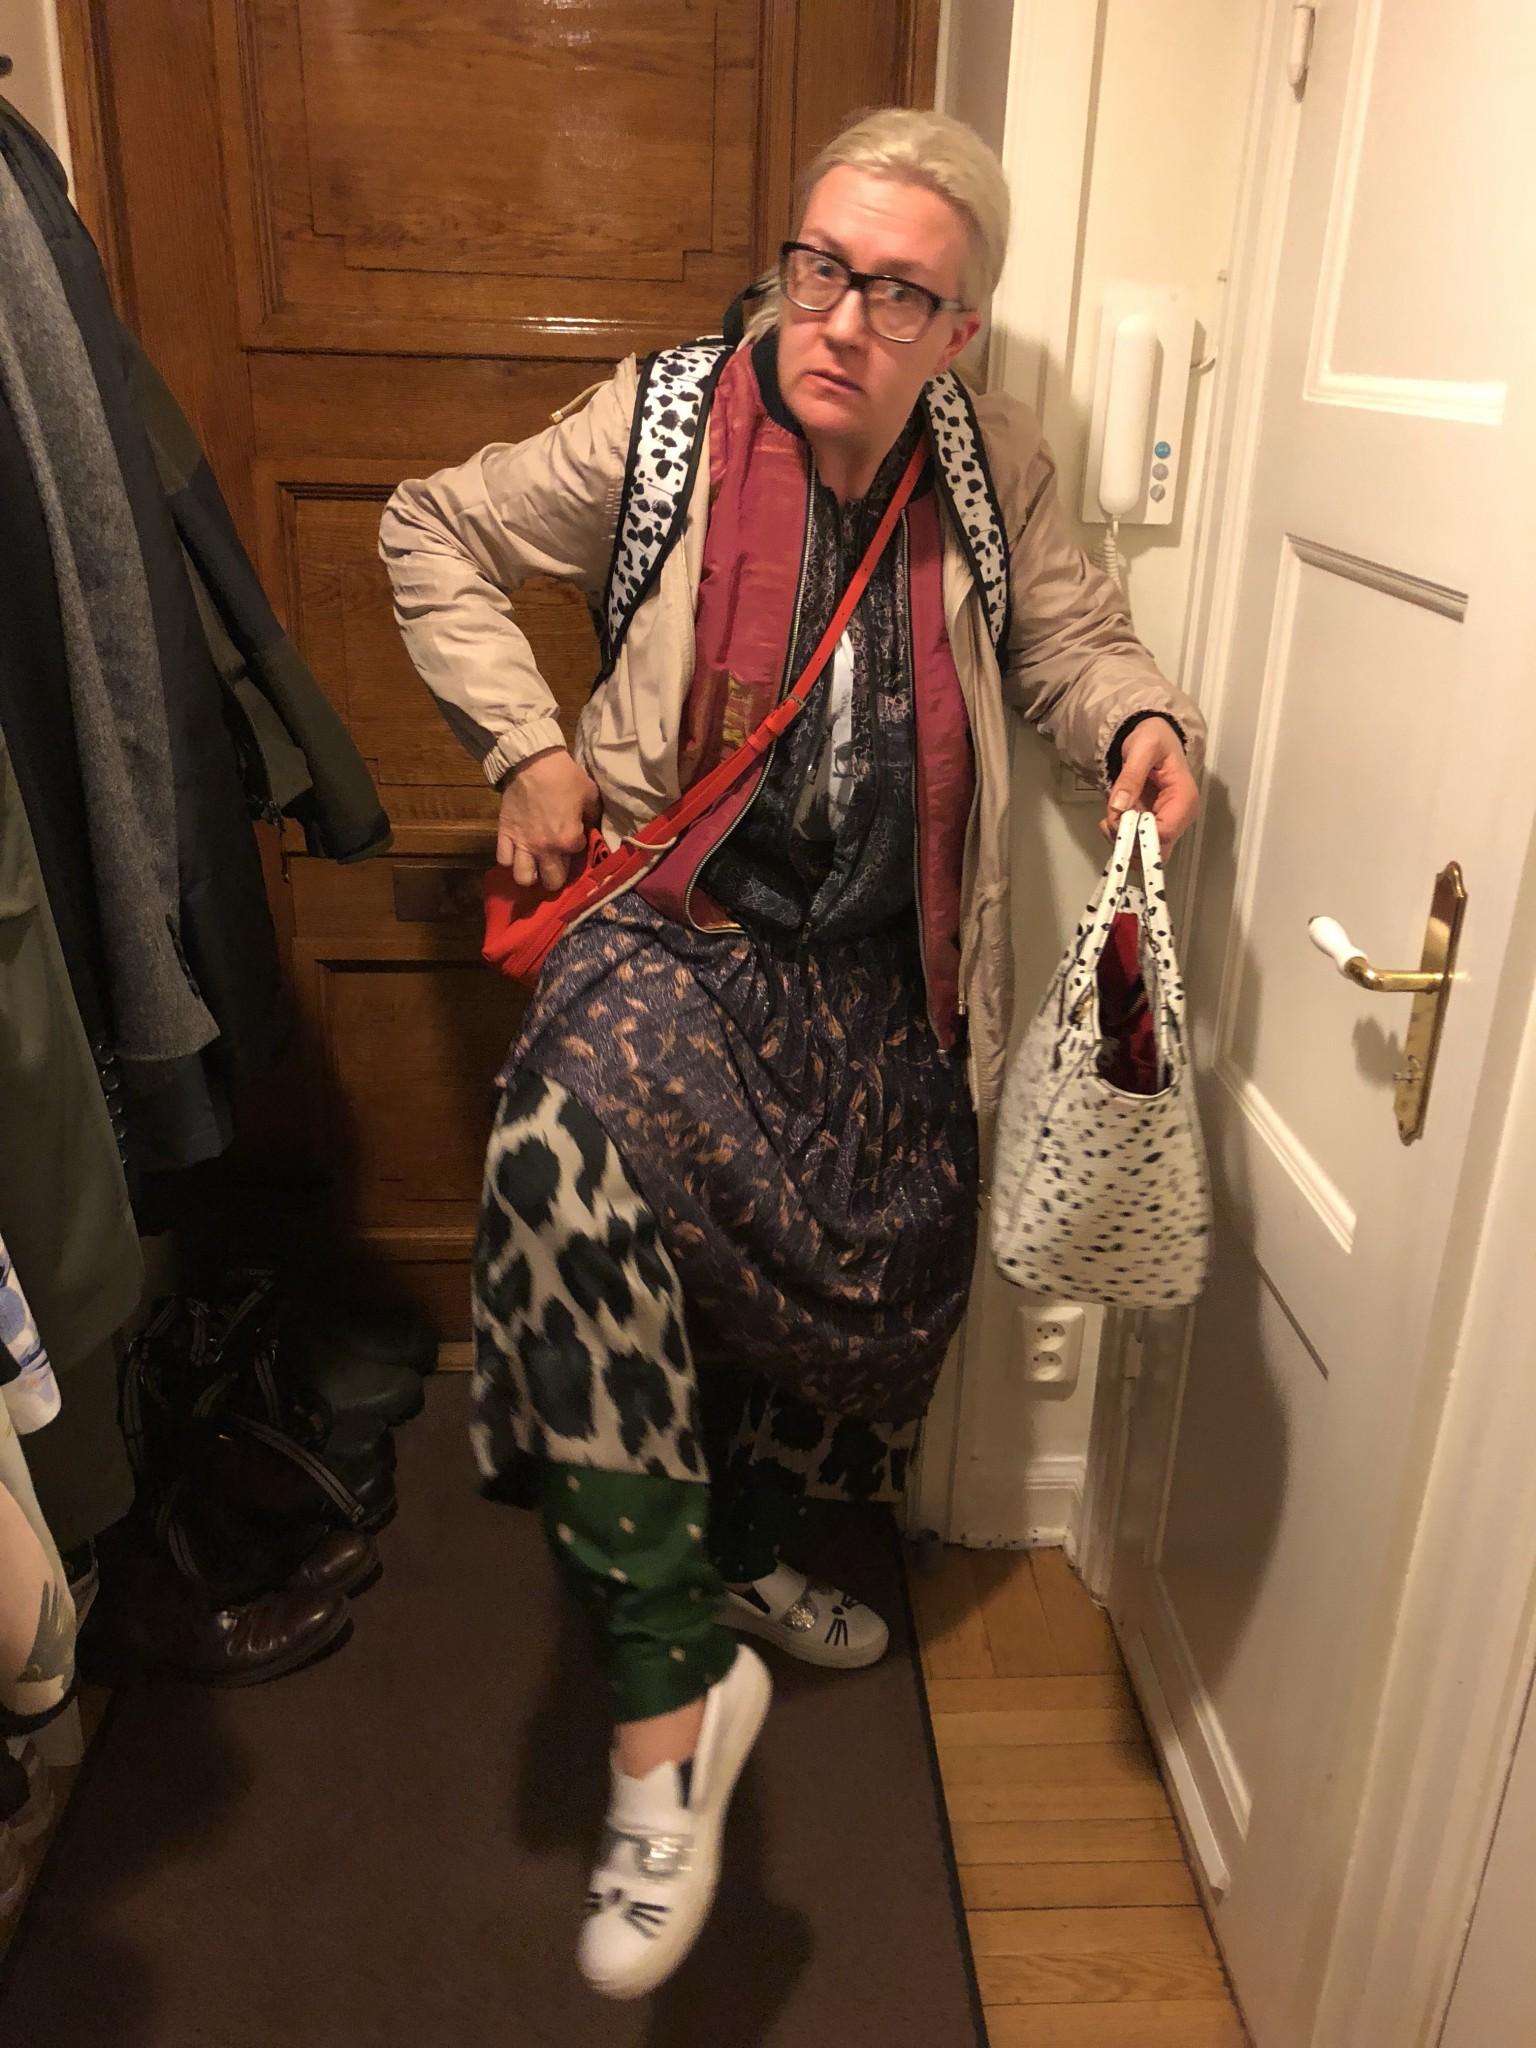 escortflickor escort i stockholm